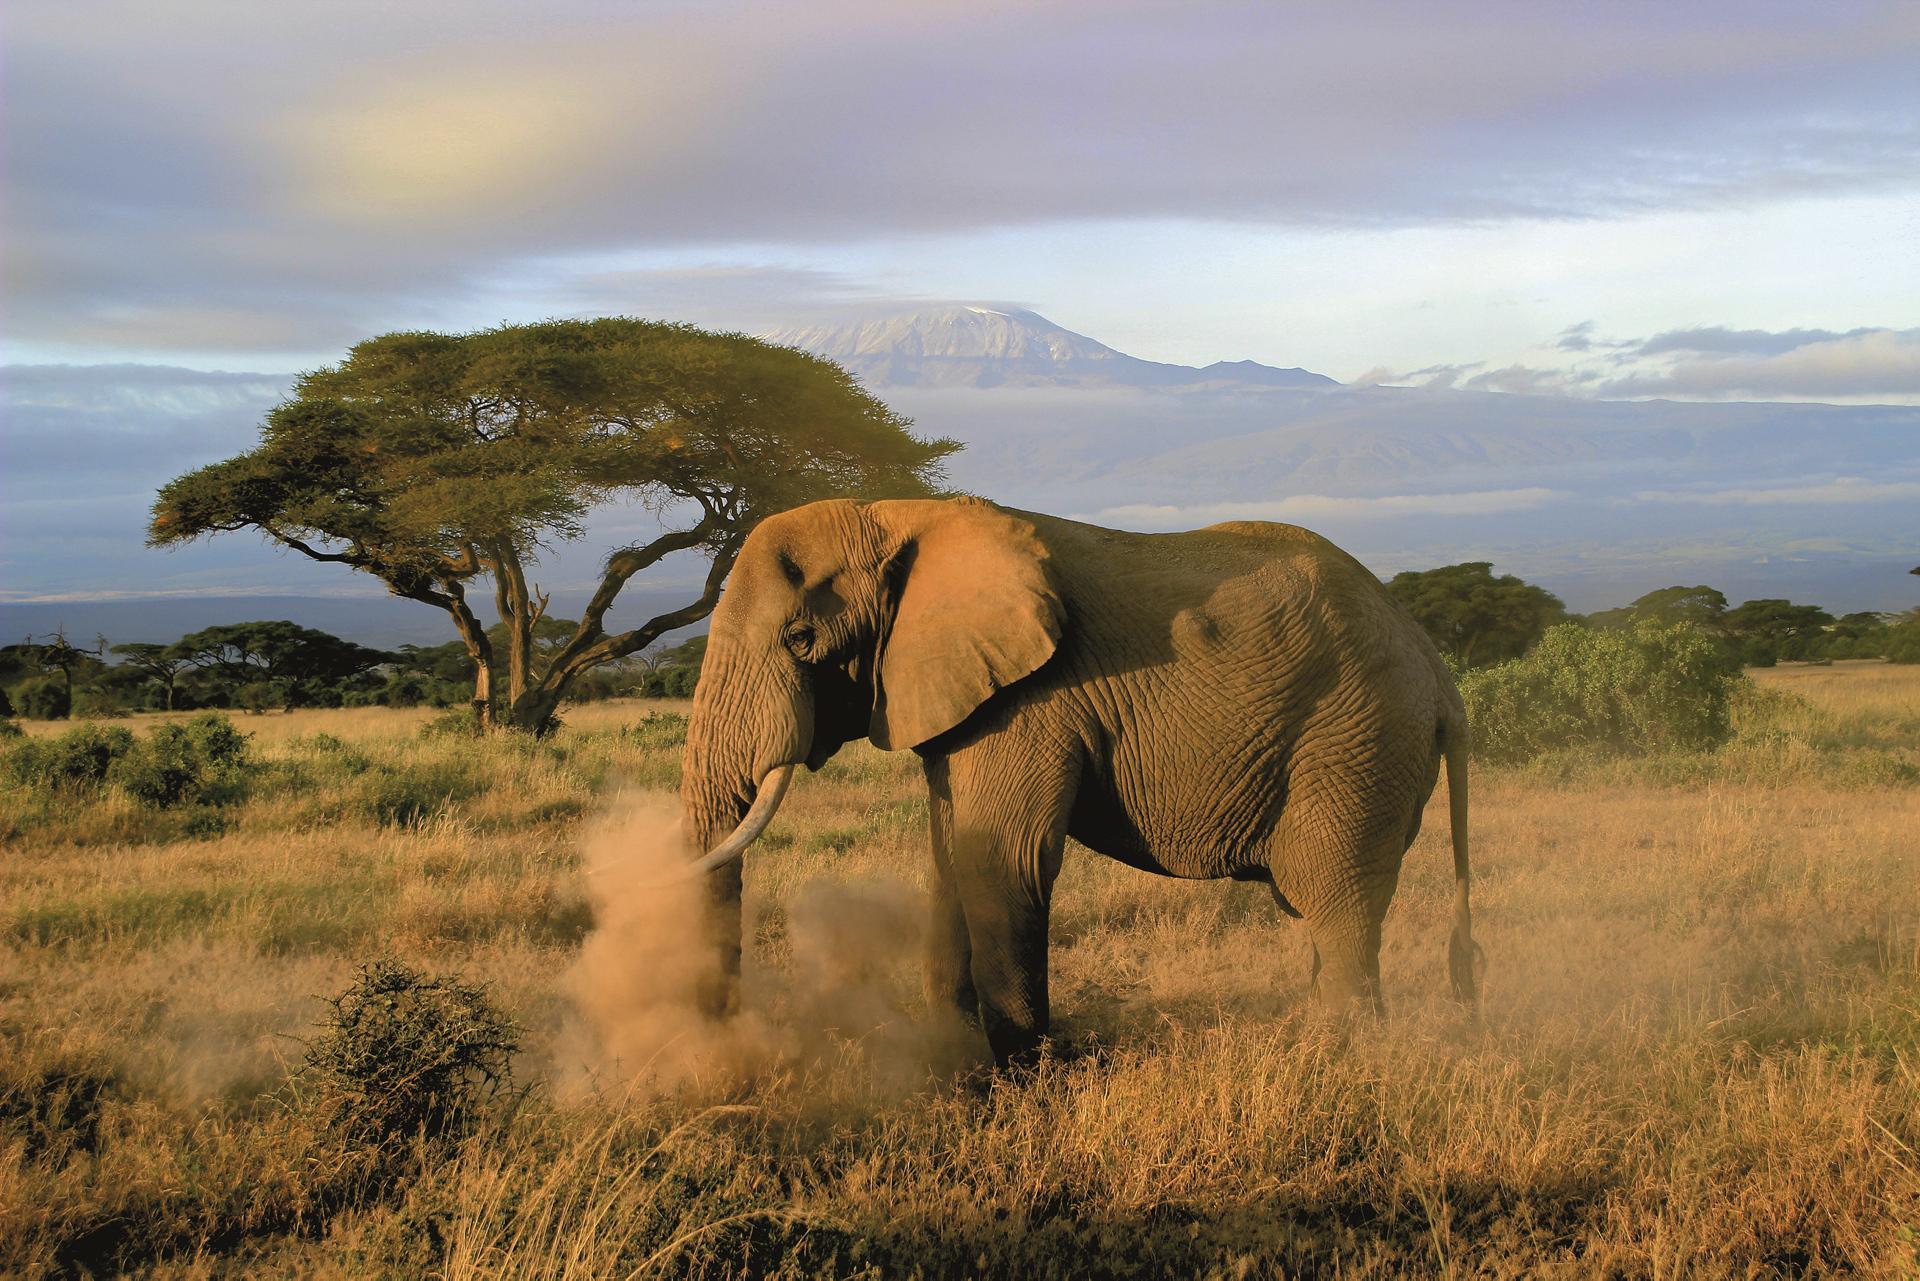 ©Olaf Schau, DIAMIR Erlebnisreisen; Im Amboseli Nationalpark